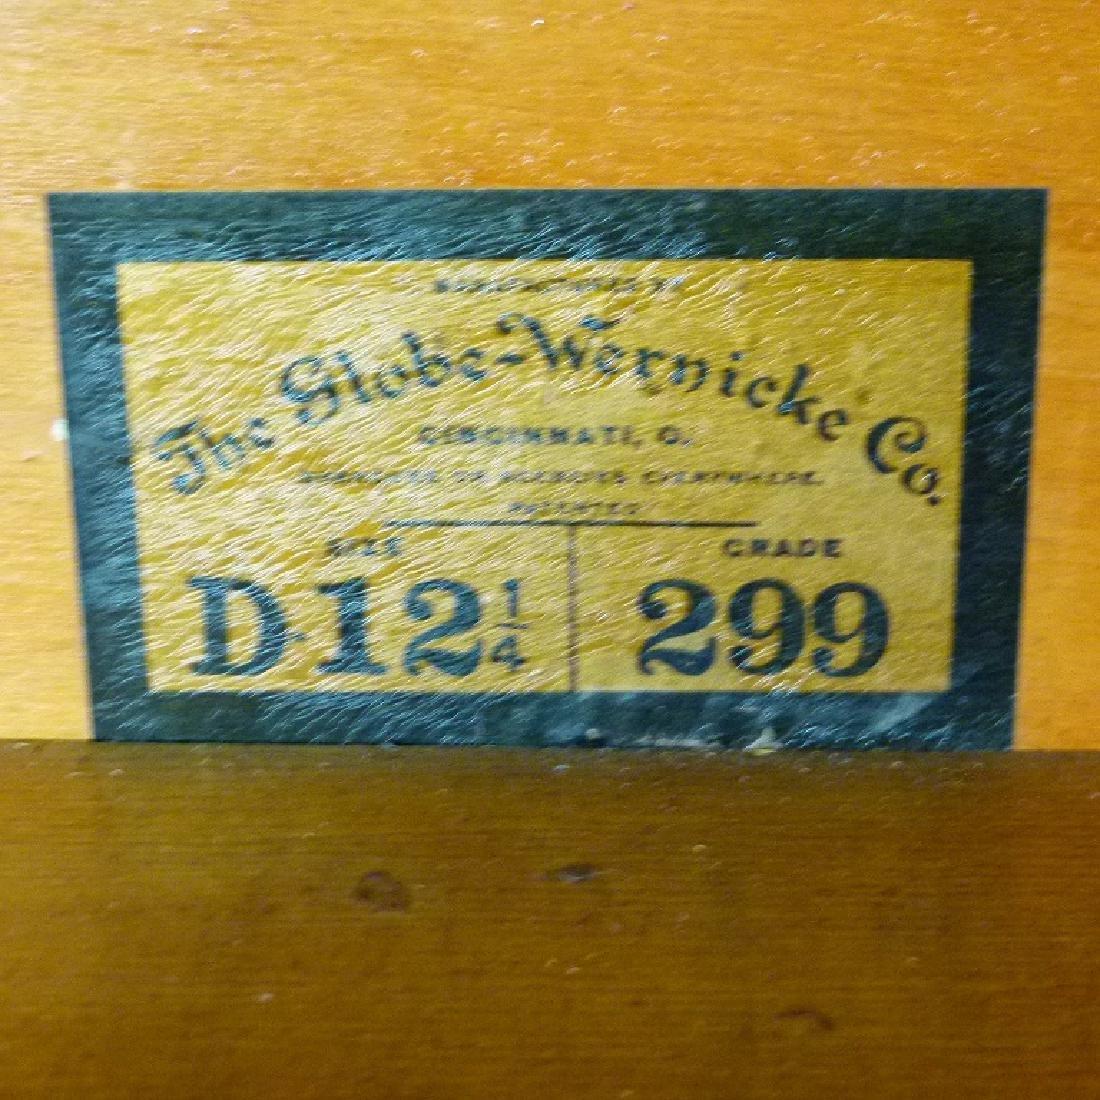 GLOBE-WERNIEKE OAK 3 STACK LAWYERS BOOKCASE, C. 1920 - 4